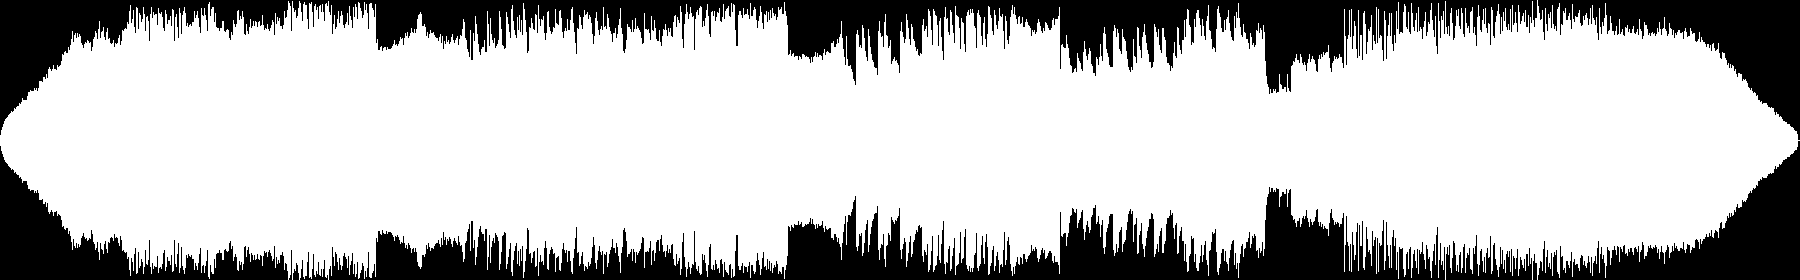 Aerial - Downtempo Piano Loops audio waveform